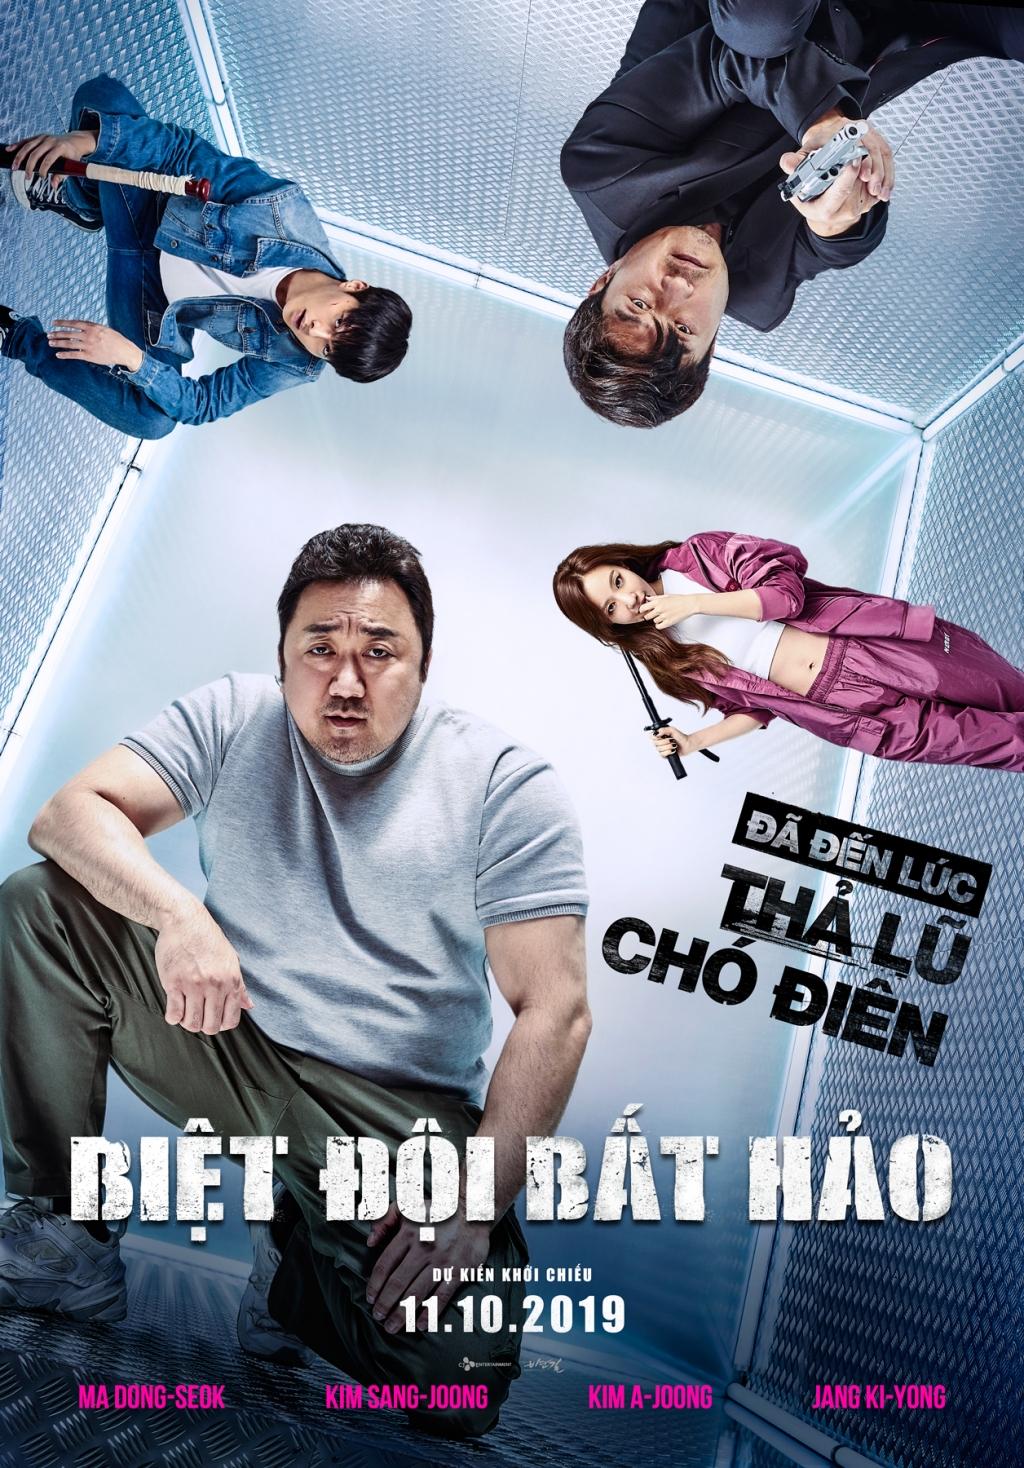 biet doi bat hao cua kim a joong va ma dong seok dan dau phong ve han 6 ngay lien tiep